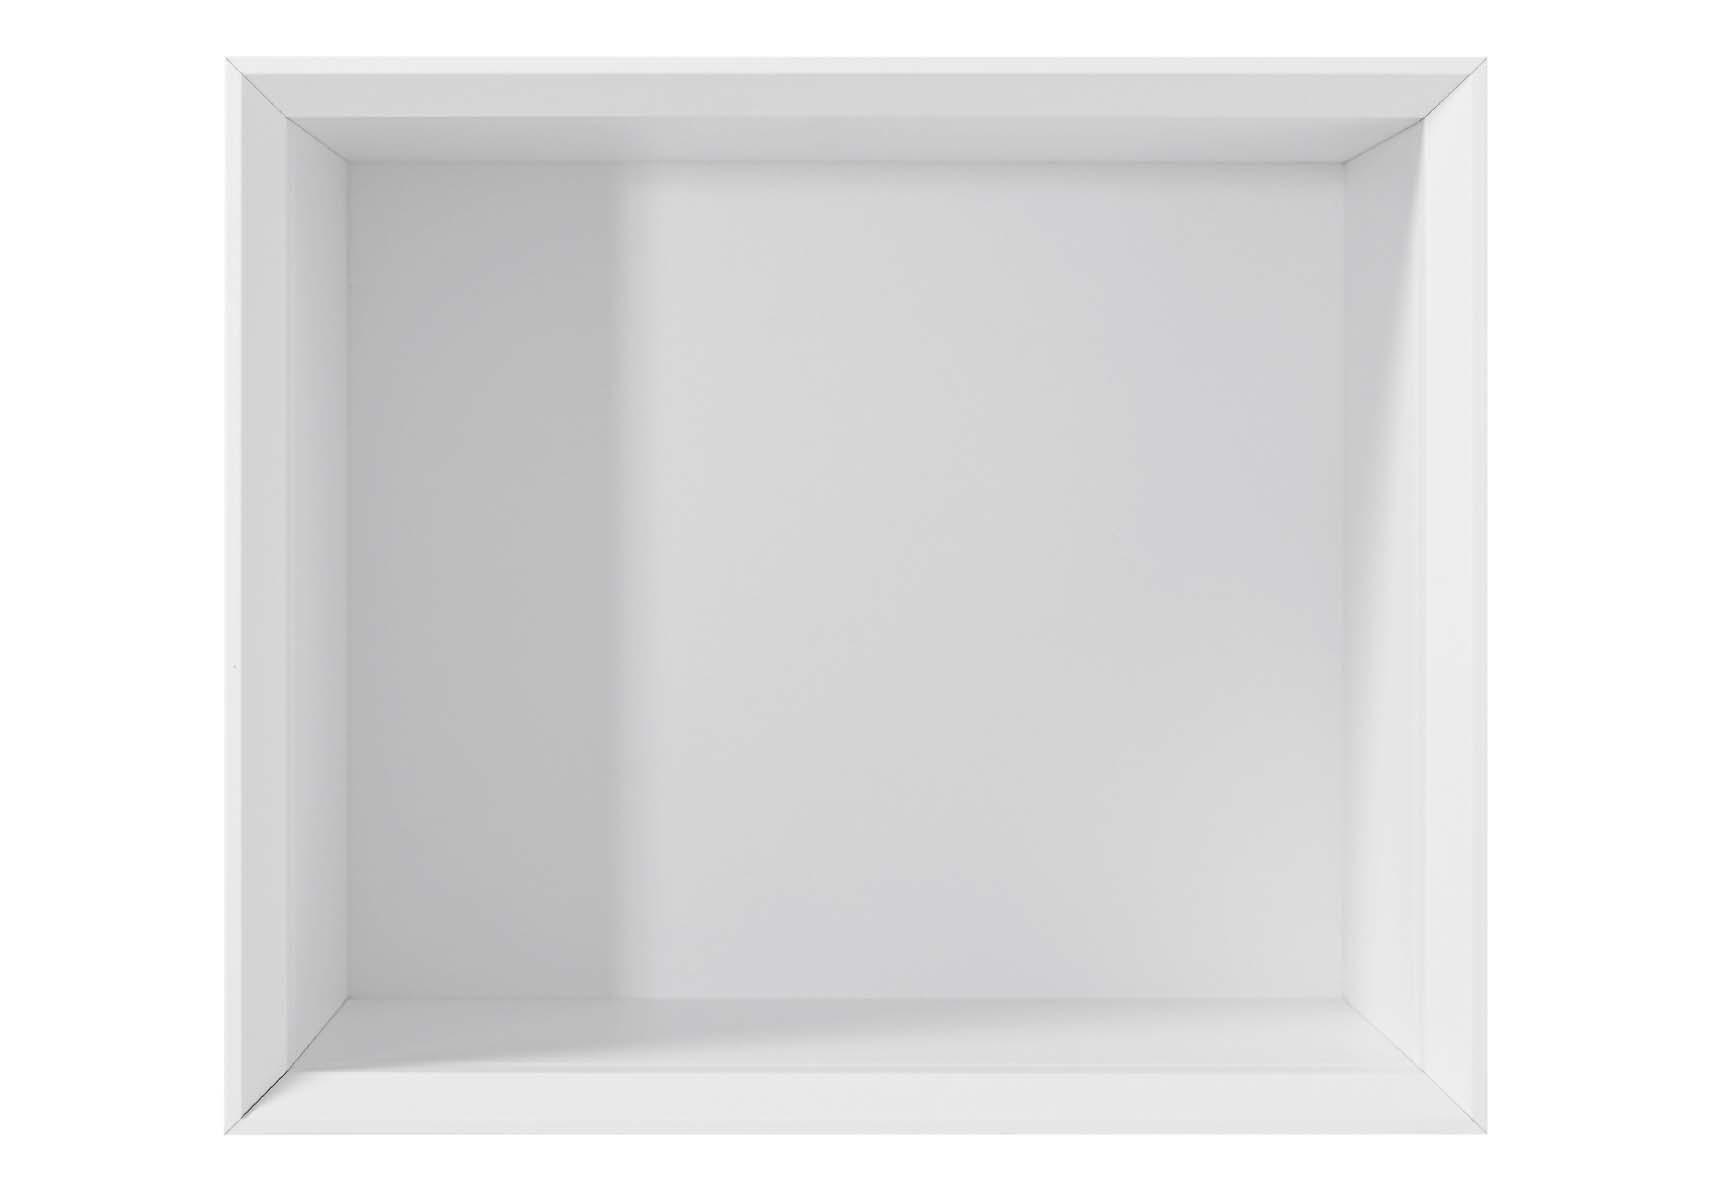 Central Small Box, 35 cm, White High Gloss